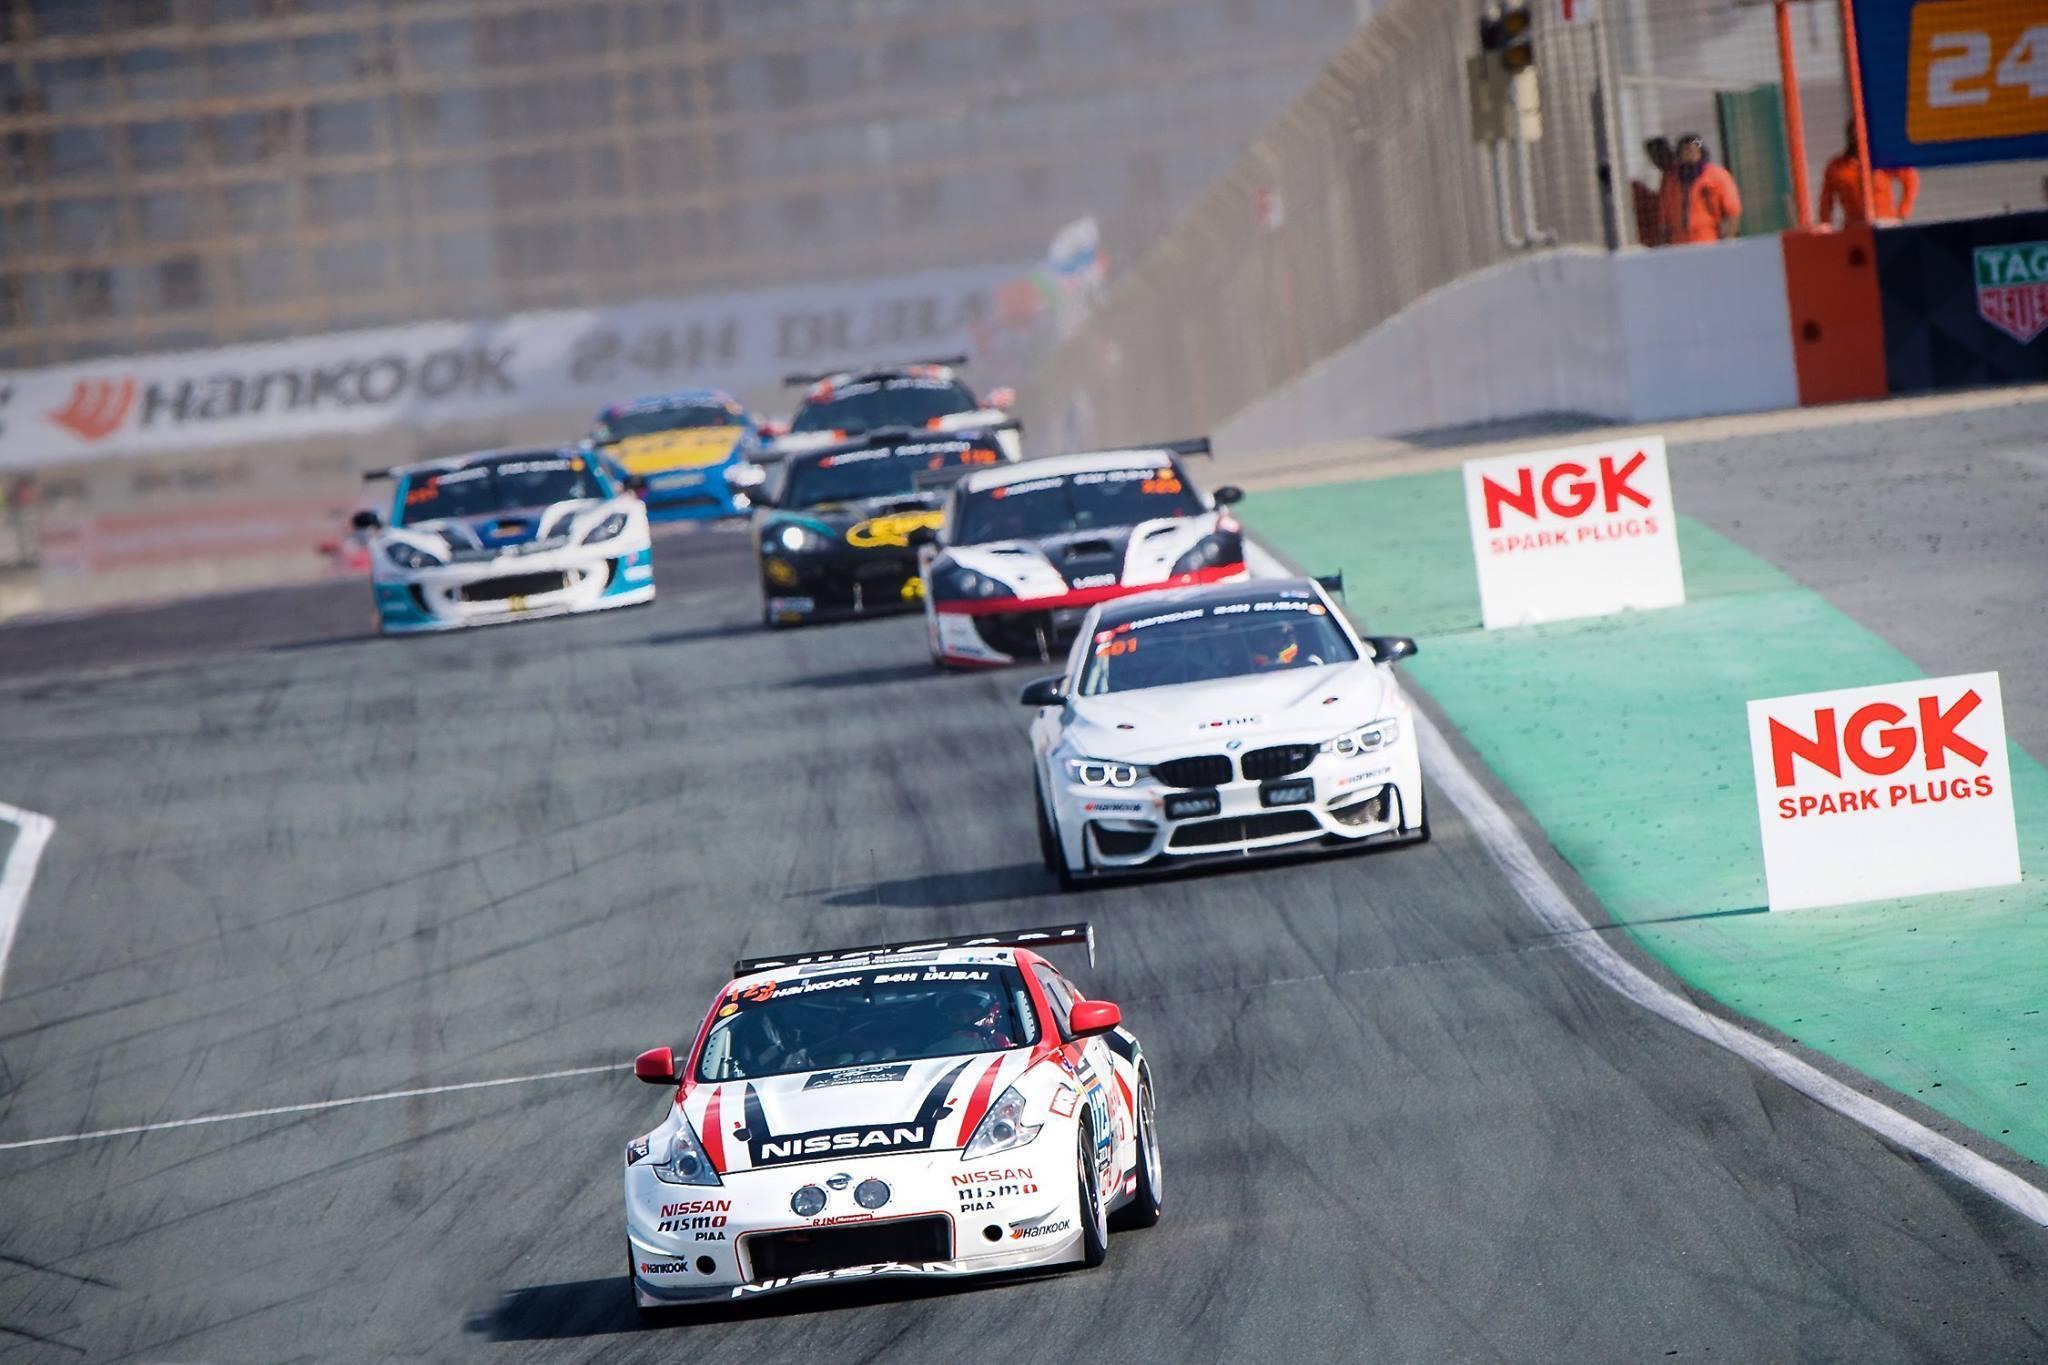 dubai racing live tv